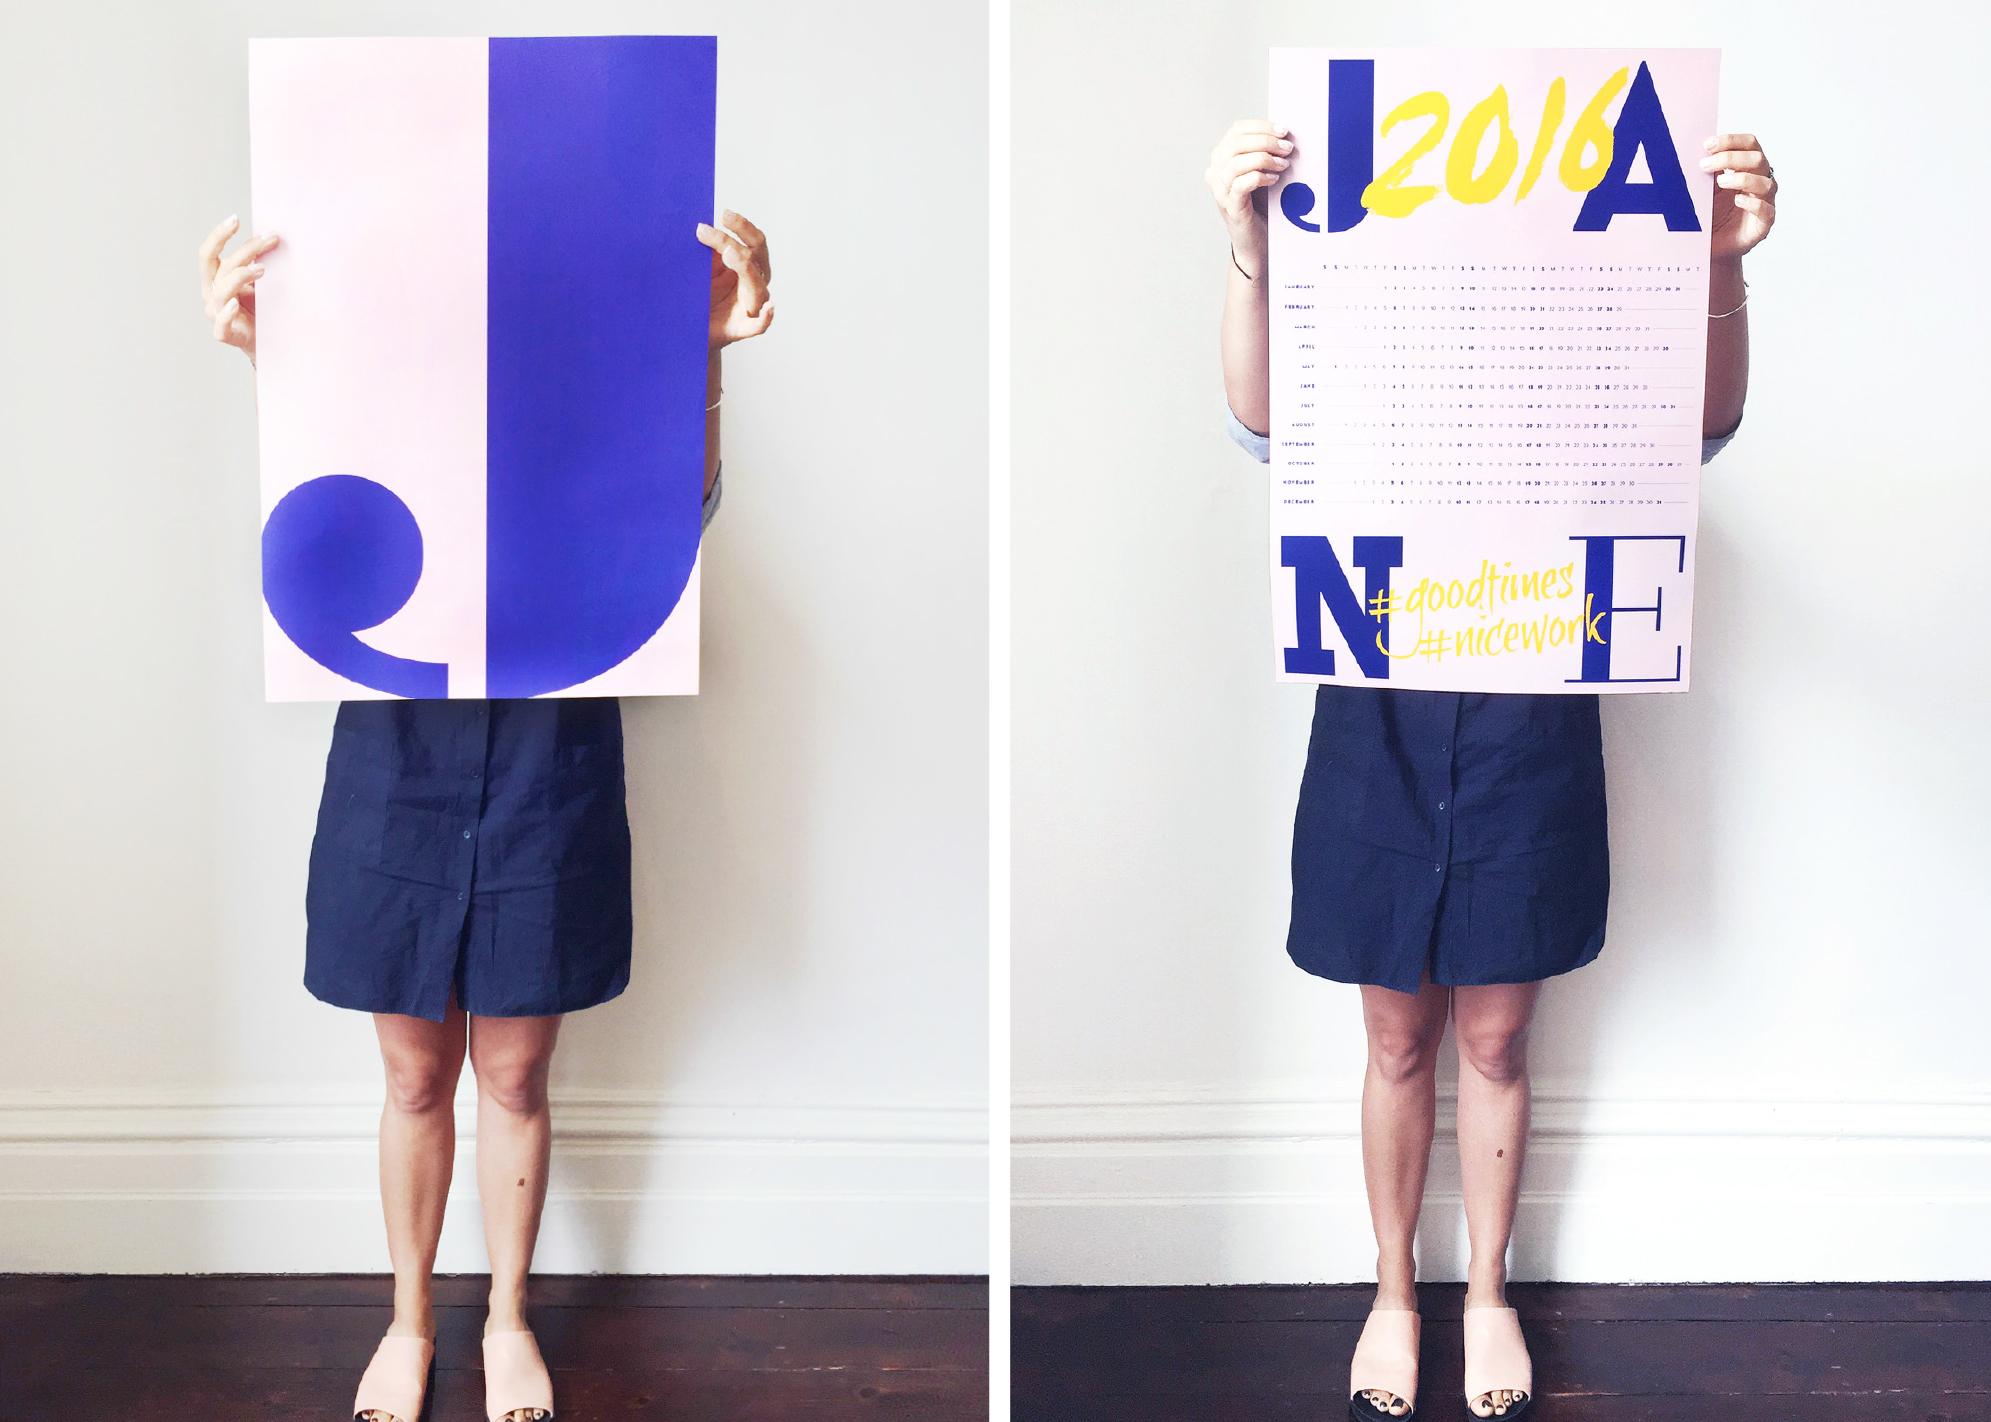 Janeuary-Posters